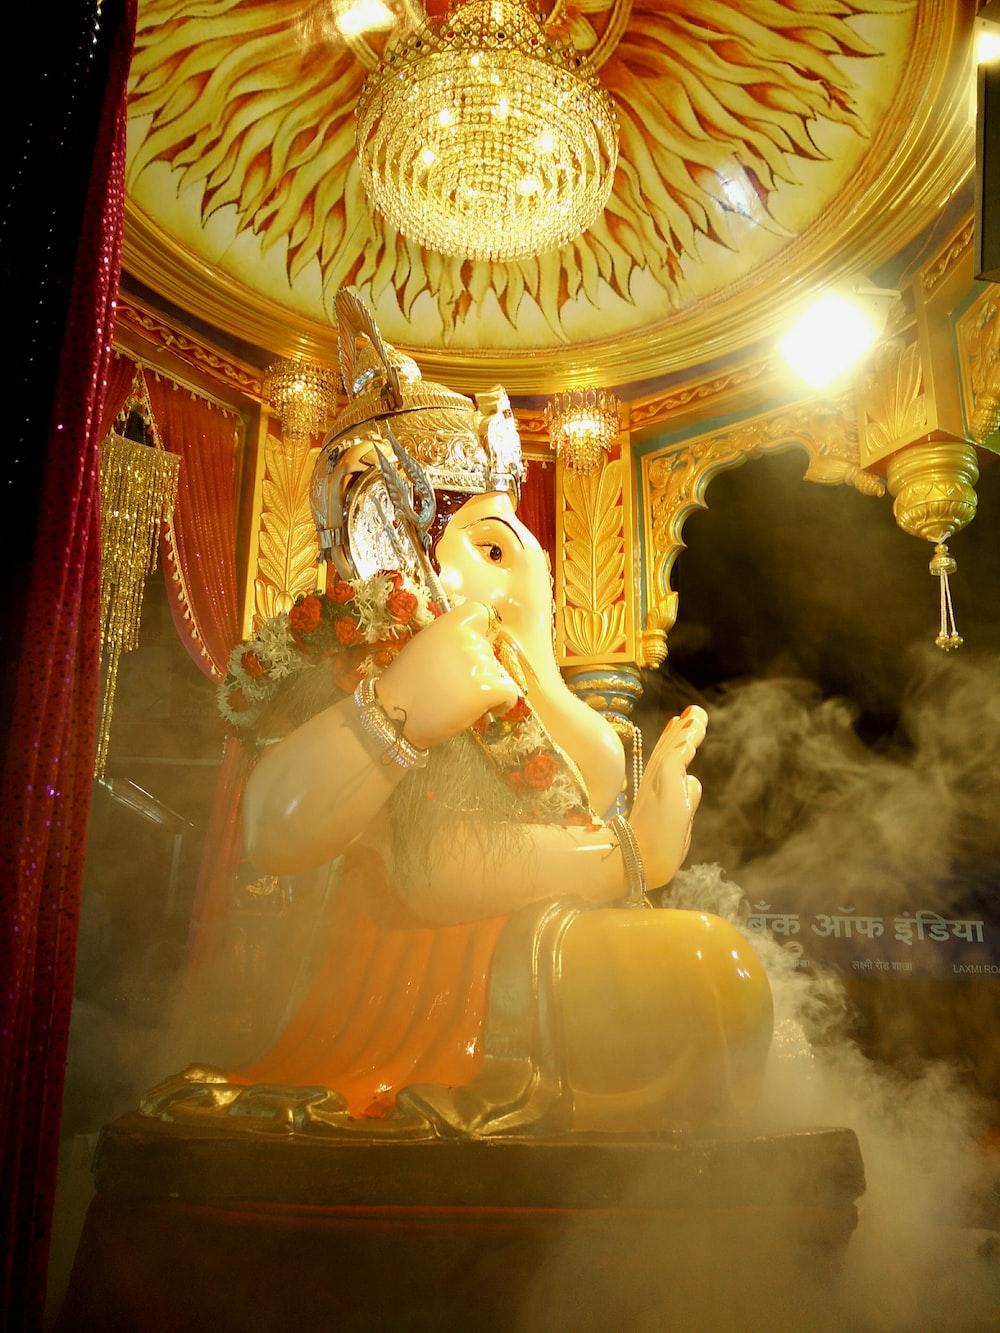 500 Hindu God Images Free Download Download Free Pictures On Unsplash